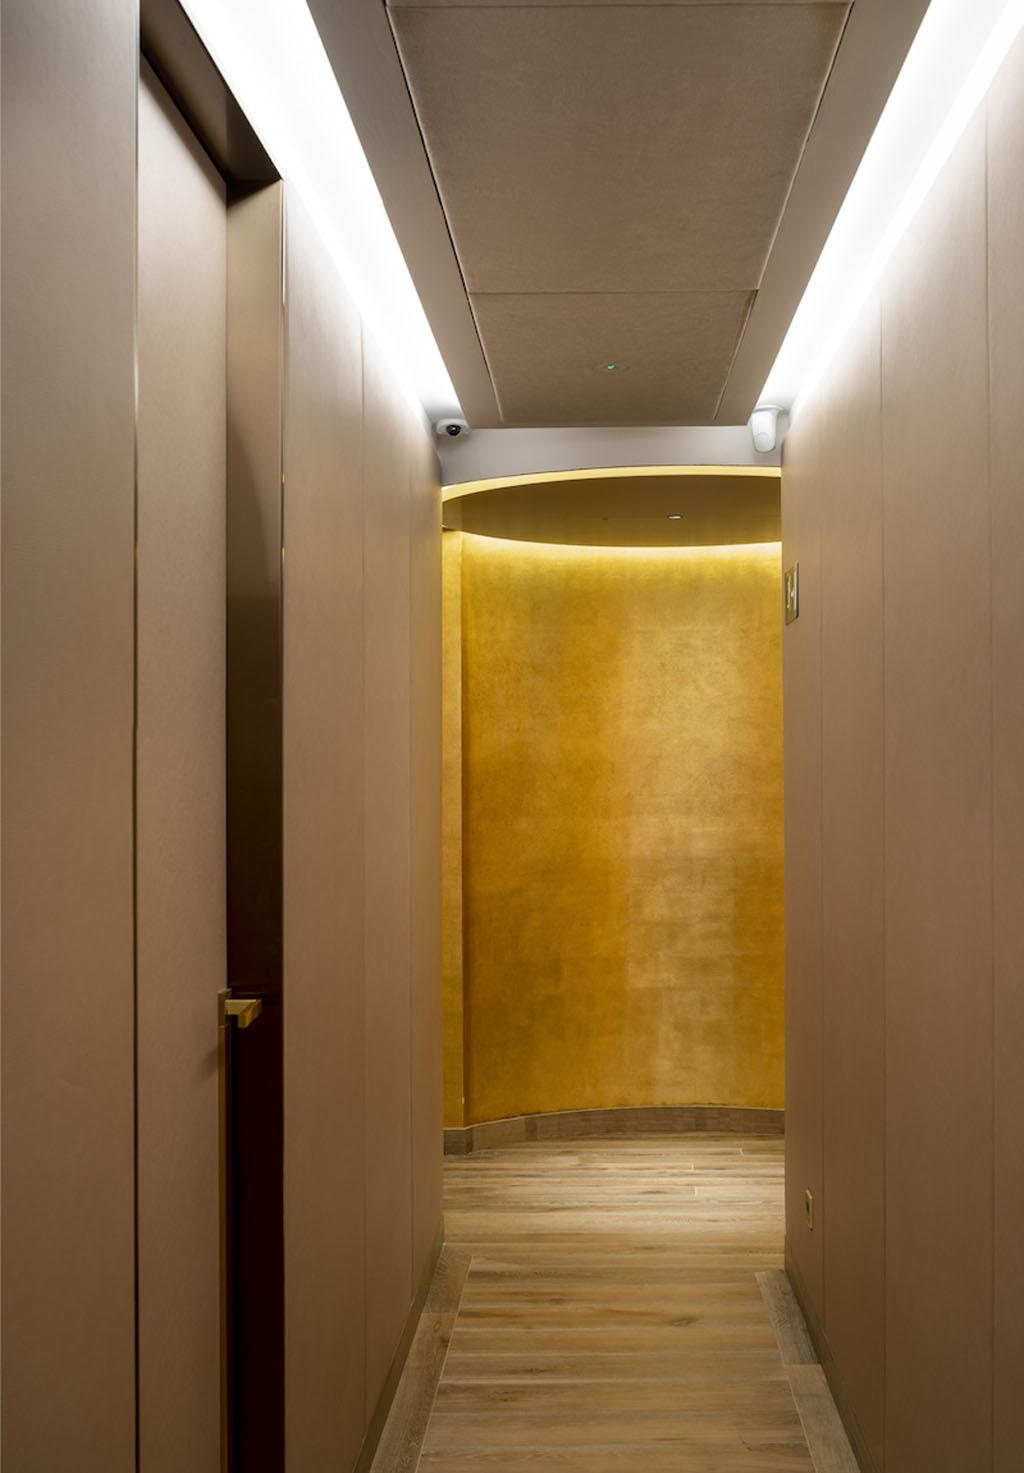 SADDLE_WEB_080-Erlantz Biderbost fotografo de arquitectura e interiores